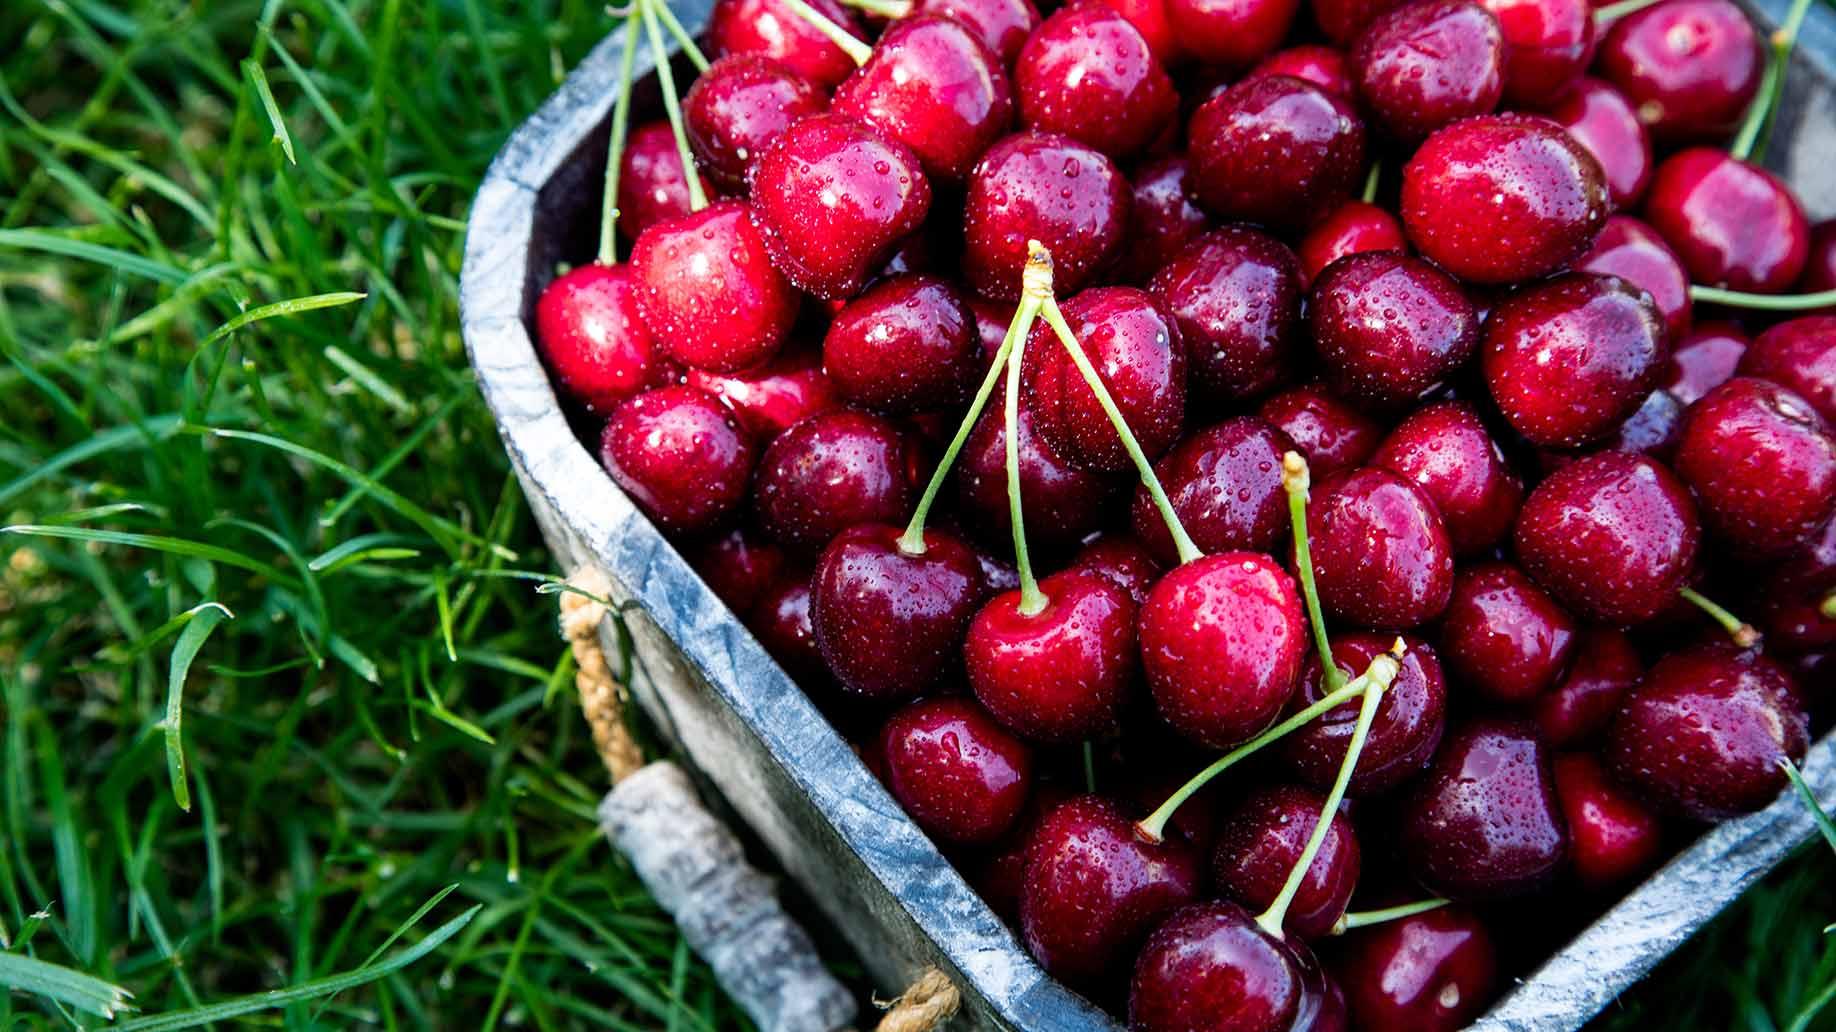 cherries cherry juice melatonin insomnia sleep disorder natural remedy aid